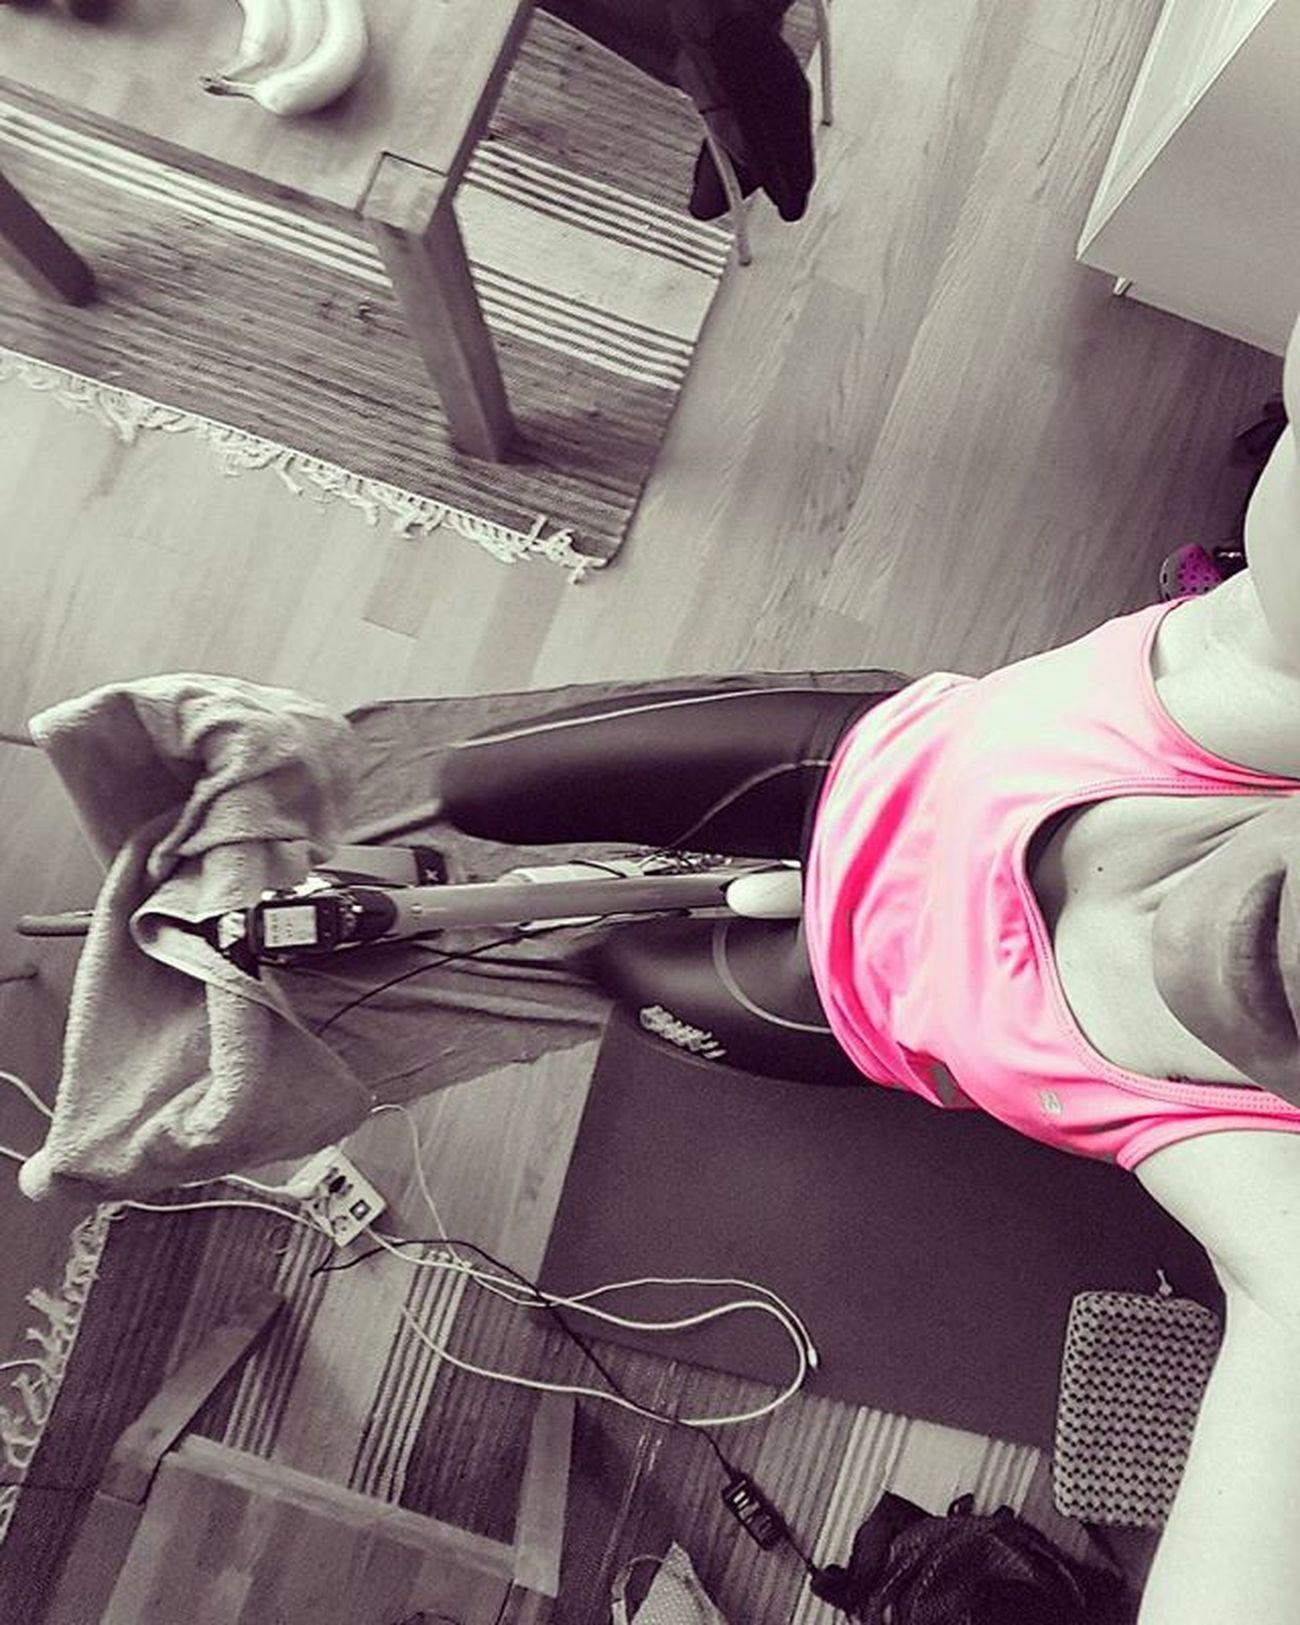 🤗🤗hopEfuLLy laSt weEk Of iNdooR cyCLiNg➡sPrinG iS aroUnD tHe coRneR🤗🤗 Cycling Stravaphoto Stravacycling Sykling Badassisbeautiful IndoorCycling  Womenonwheels Ridelikeagirl Sportaddict Wilier Craftcycling Ciclismo Ilovecycling LOVES_BIKES Loves_sport Instasport Kongsberg Paincave Bikegirl ILoveMyBike Fewmoredays Springcomeon Mylifemyadventure Keeponsmiling Lifeisgood ig_neverstopexploring maxjoy sportgirl nevergiveup